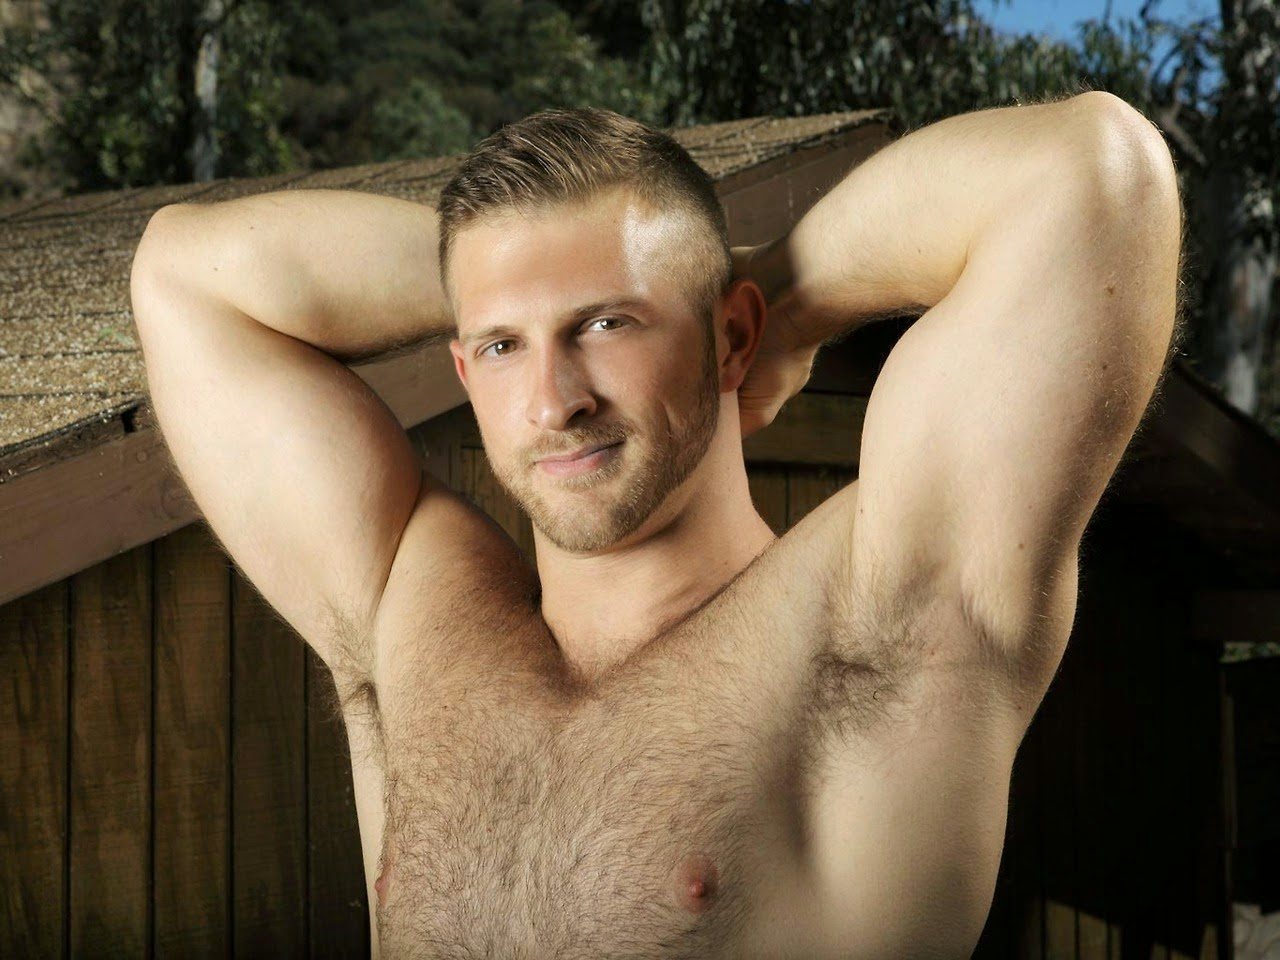 Пол вагнер порно актер фото 318-992